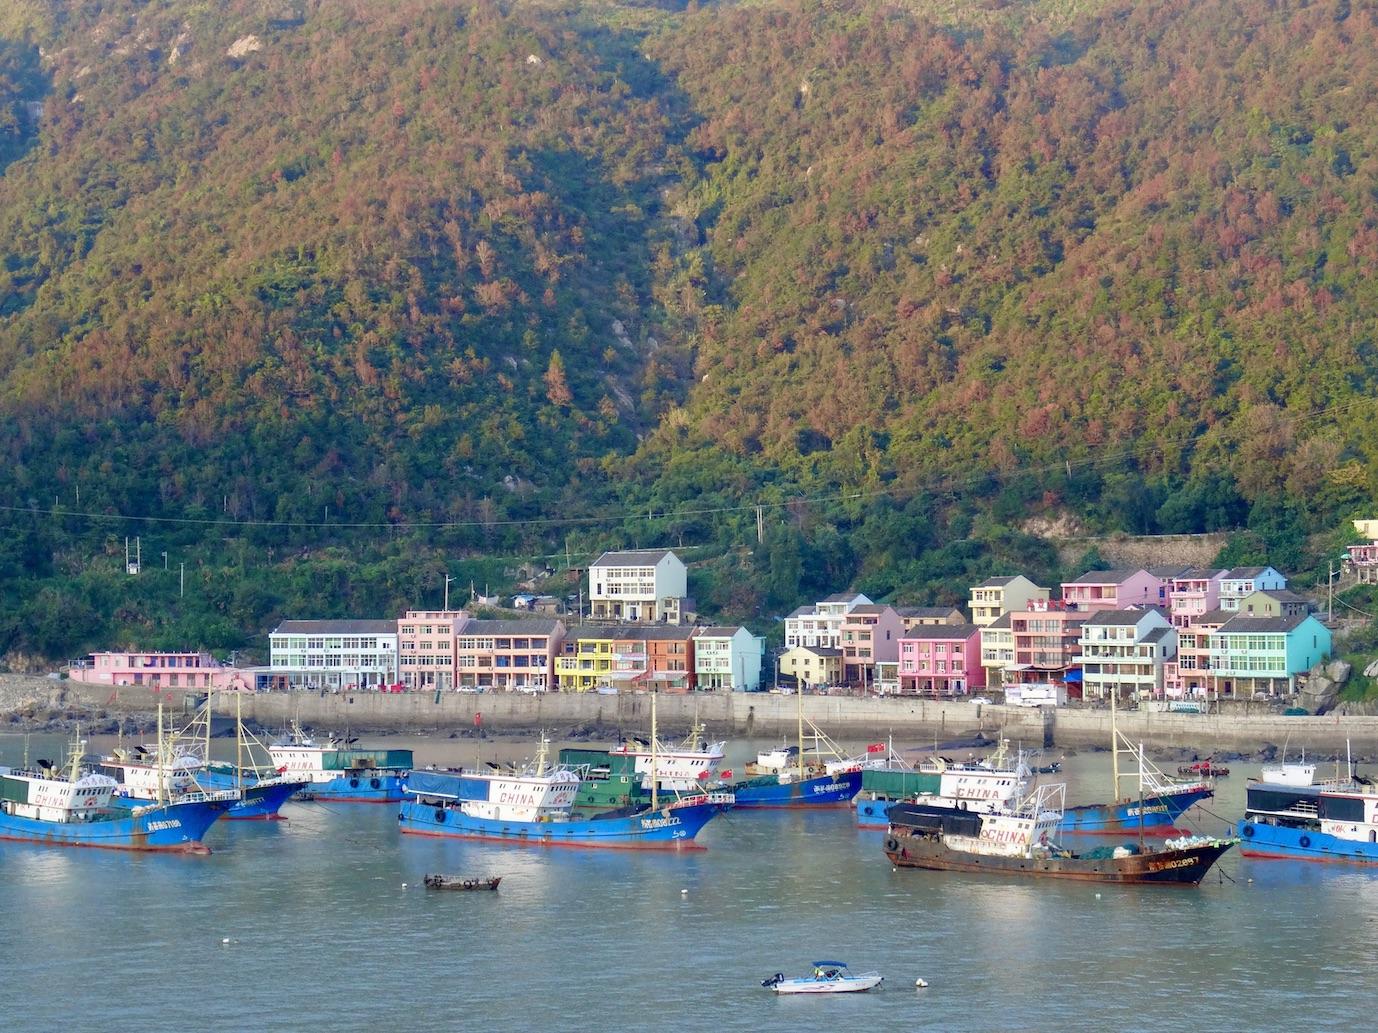 Wucheng Village Cangnan County China.